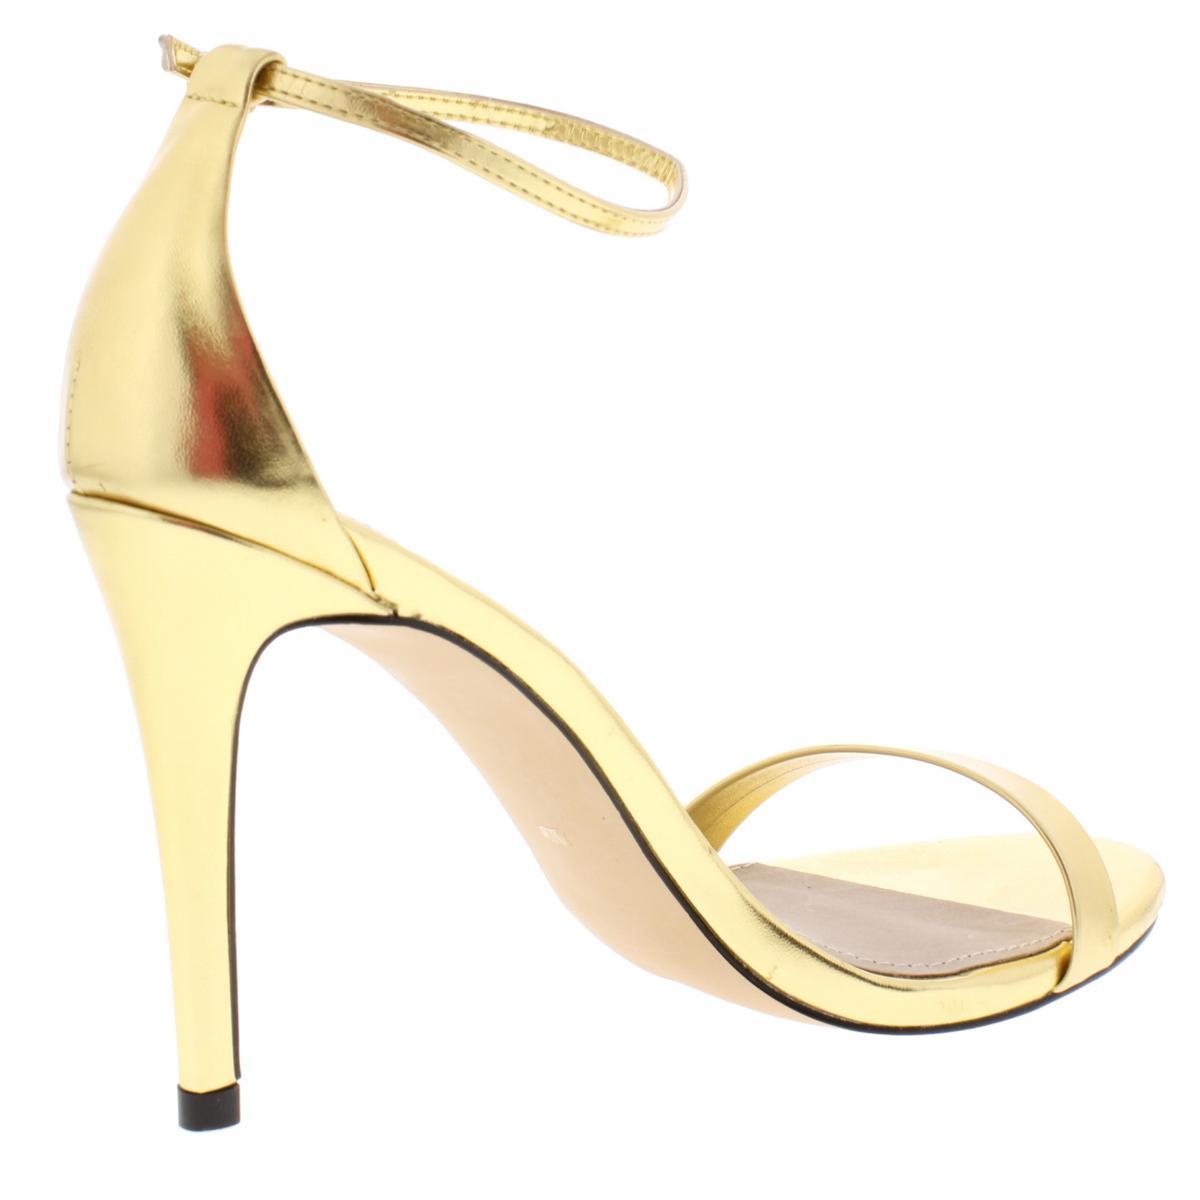 Steve-Madden-Womens-Stecy-Dress-Evening-Sandals-Shoes-BHFO-6444 thumbnail 6